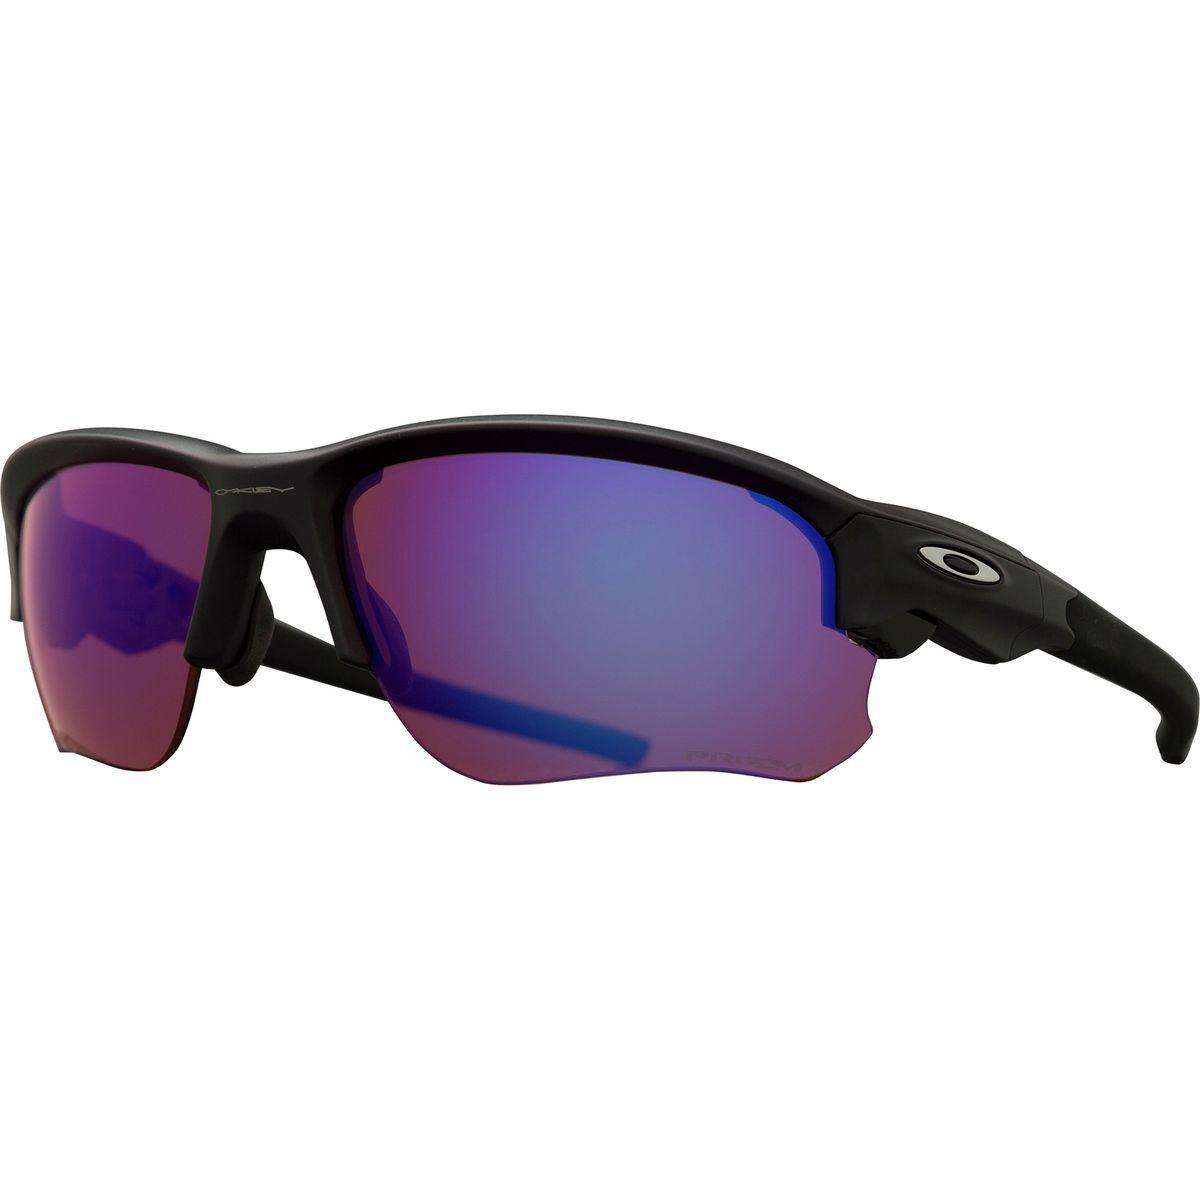 cb12a5393e spain oakley polarized chainlink sunglasses hut 8bdea c191c